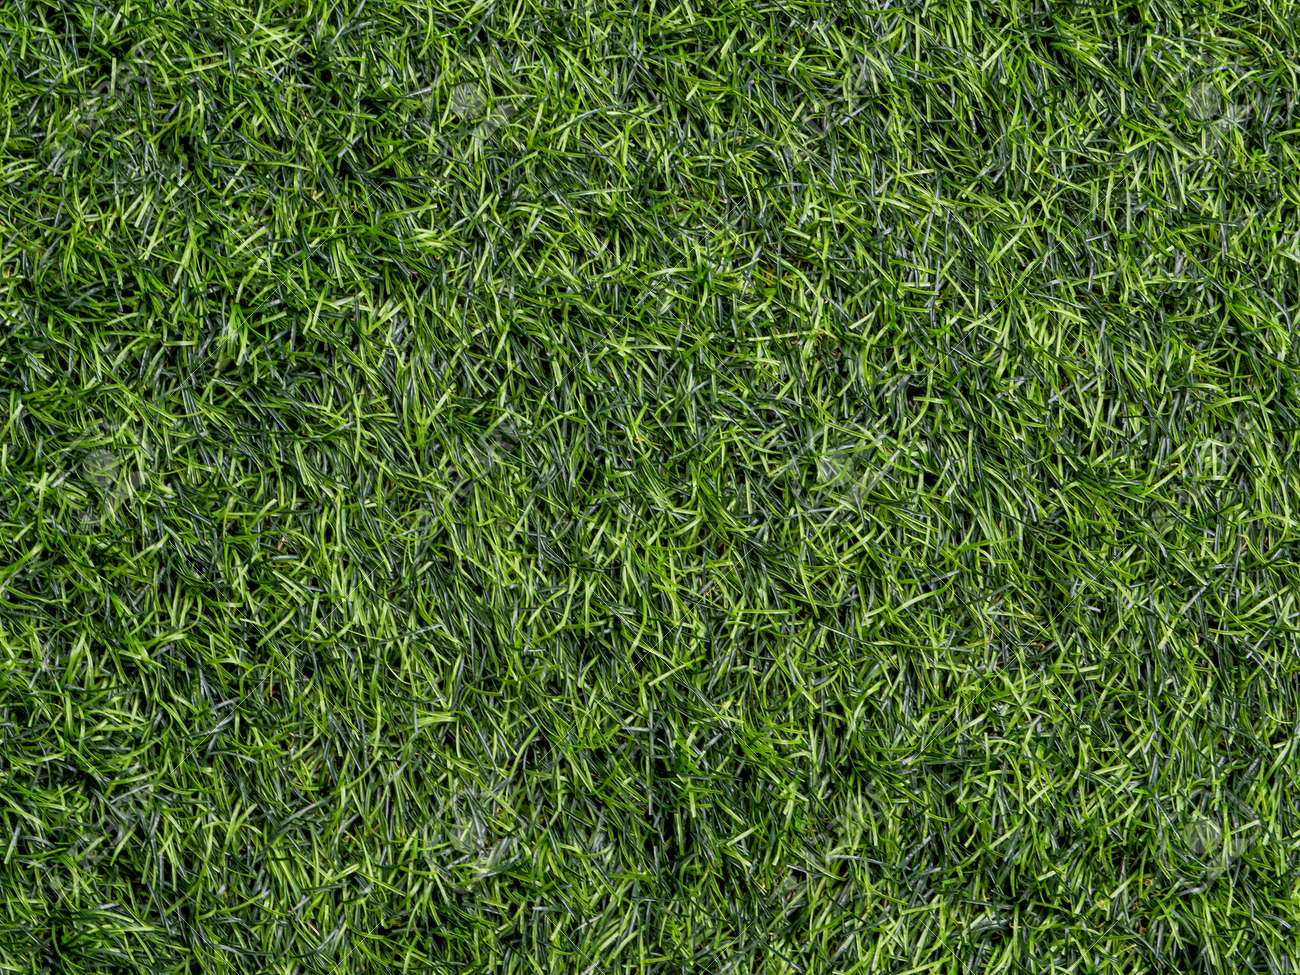 Texture of plastic artificial grass of school yard - 172430101